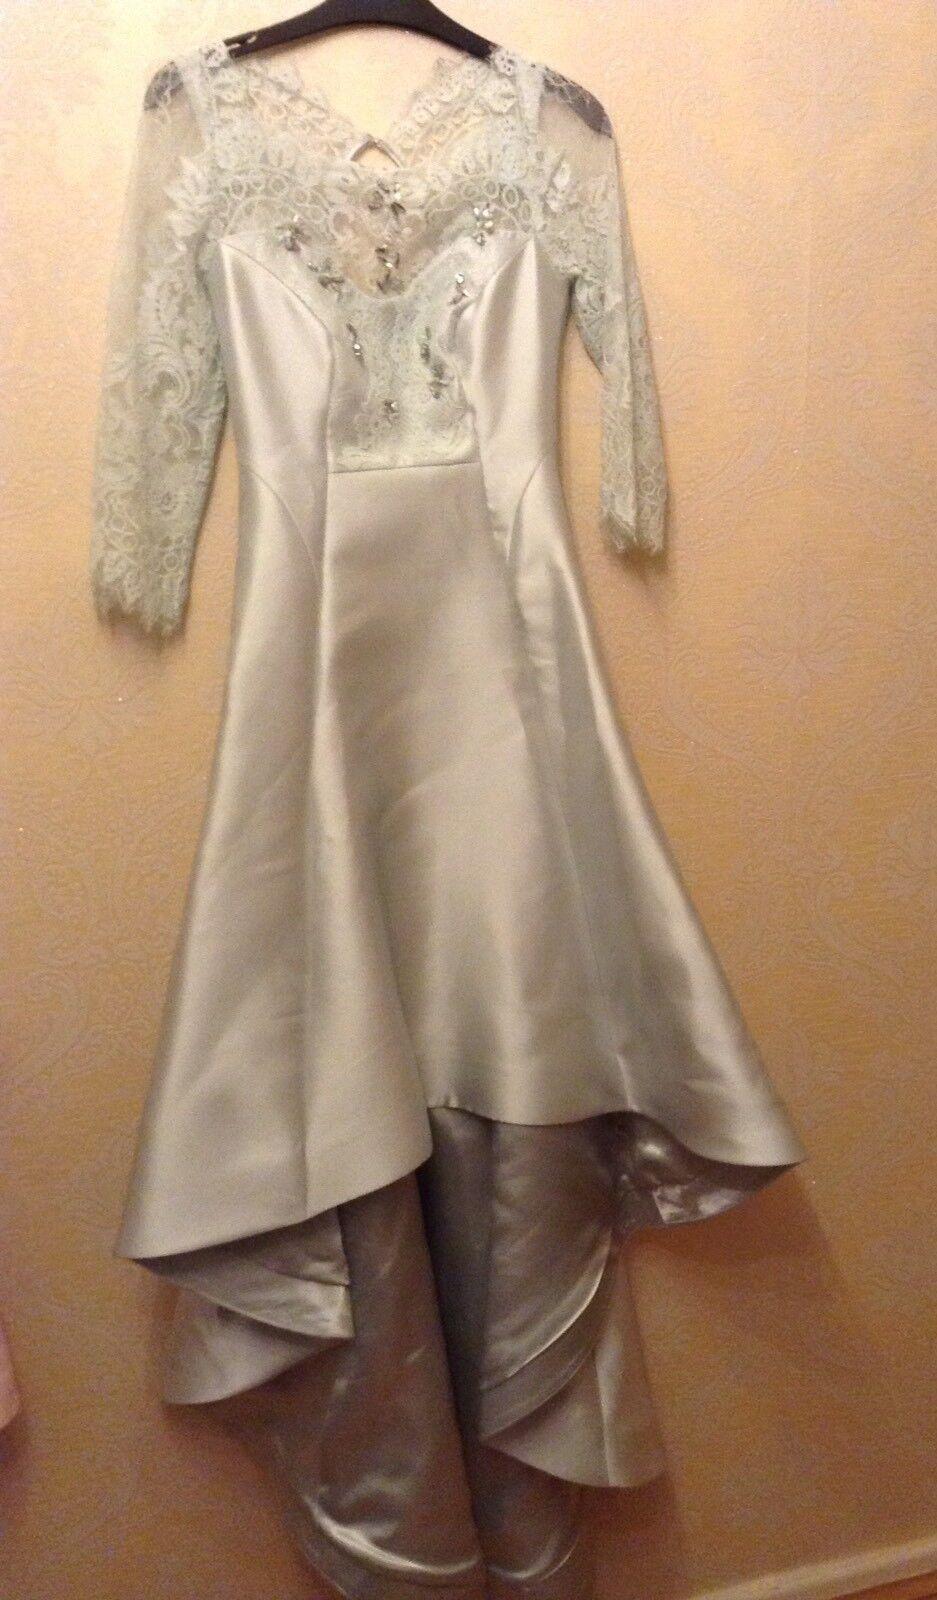 BNWT❤️Coast❤️Größe 8 Ramora Mint High Low Dress Me Prom Gown Lace Sleeves